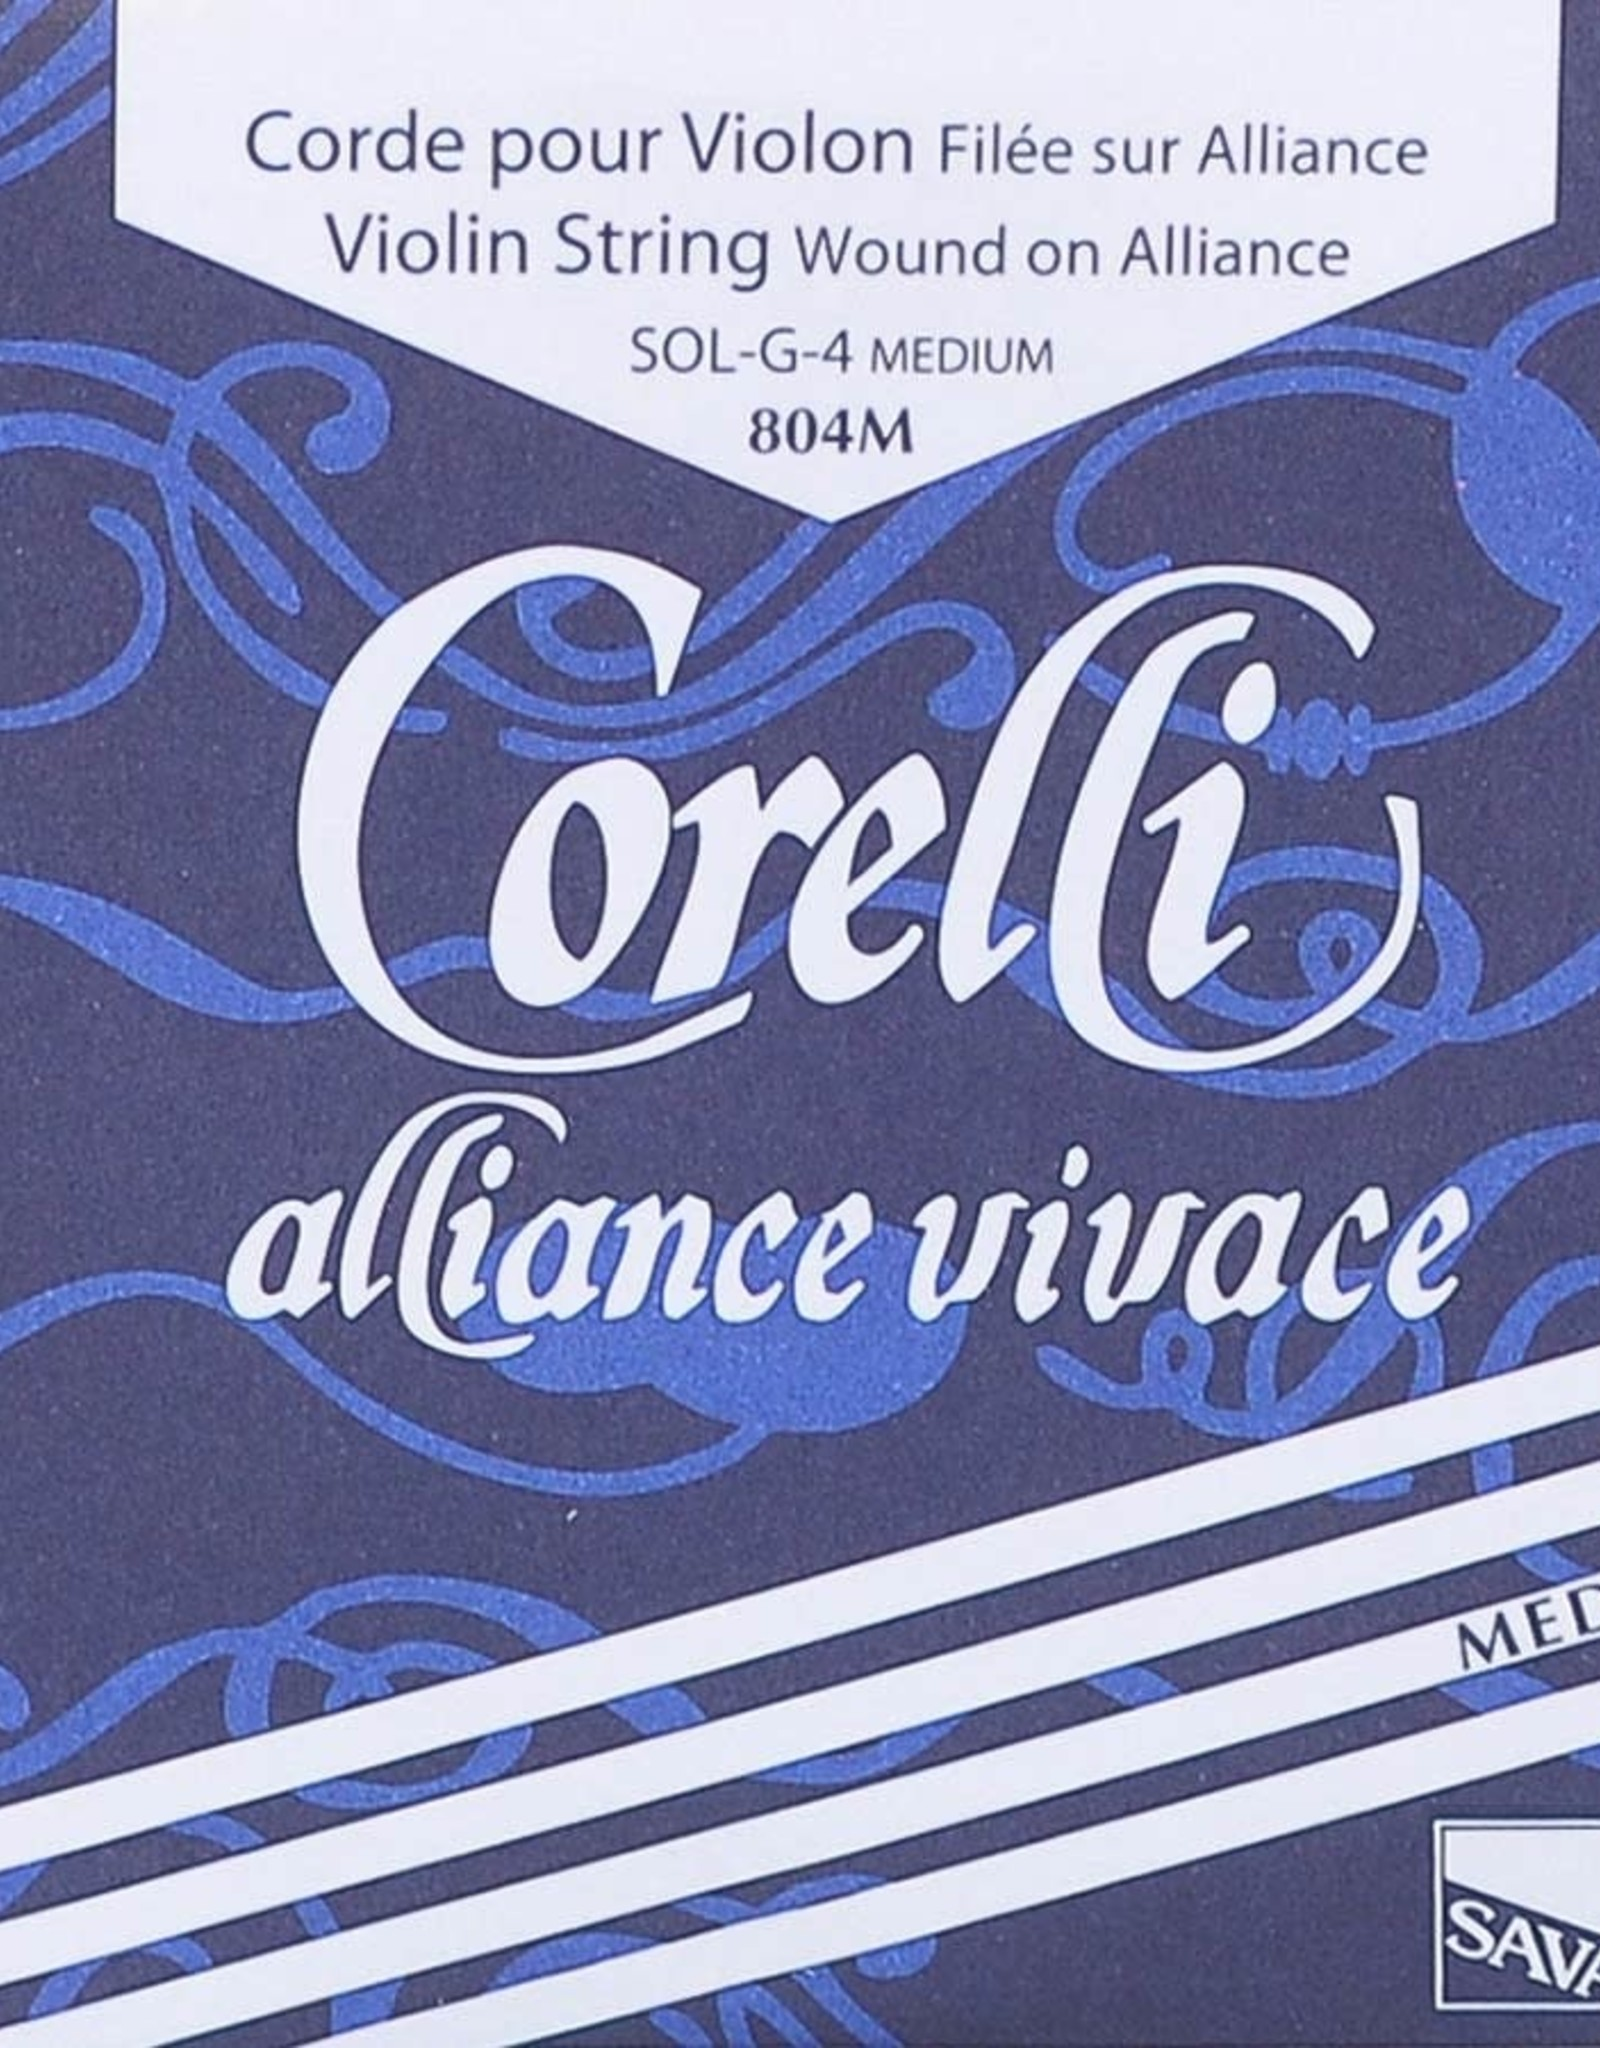 CORELLI Alliance vivace, vioolsnaar, sol (g-4), 4/4